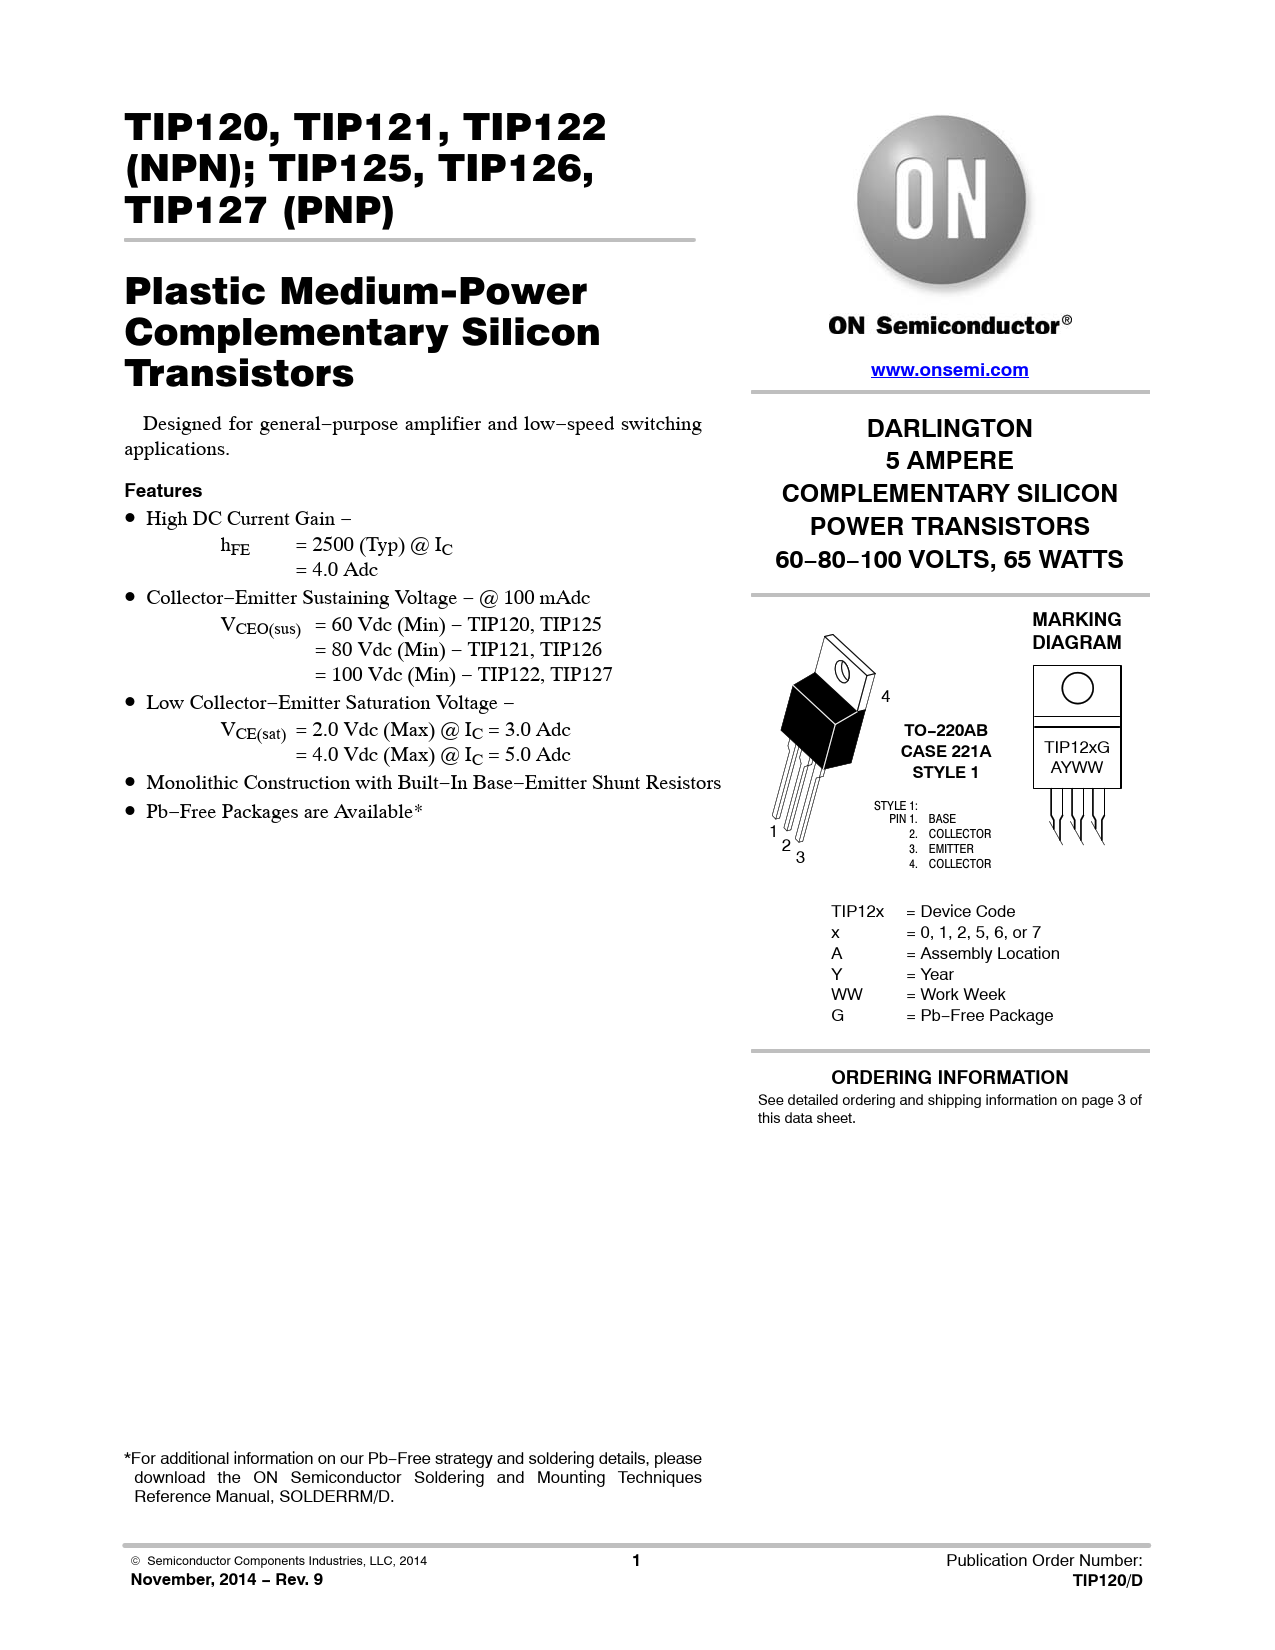 Datasheet TIP120, TIP121, TIP122 (NPN); TIP125, TIP126, TIP127 (PNP) ON Semiconductor, Версия: 9